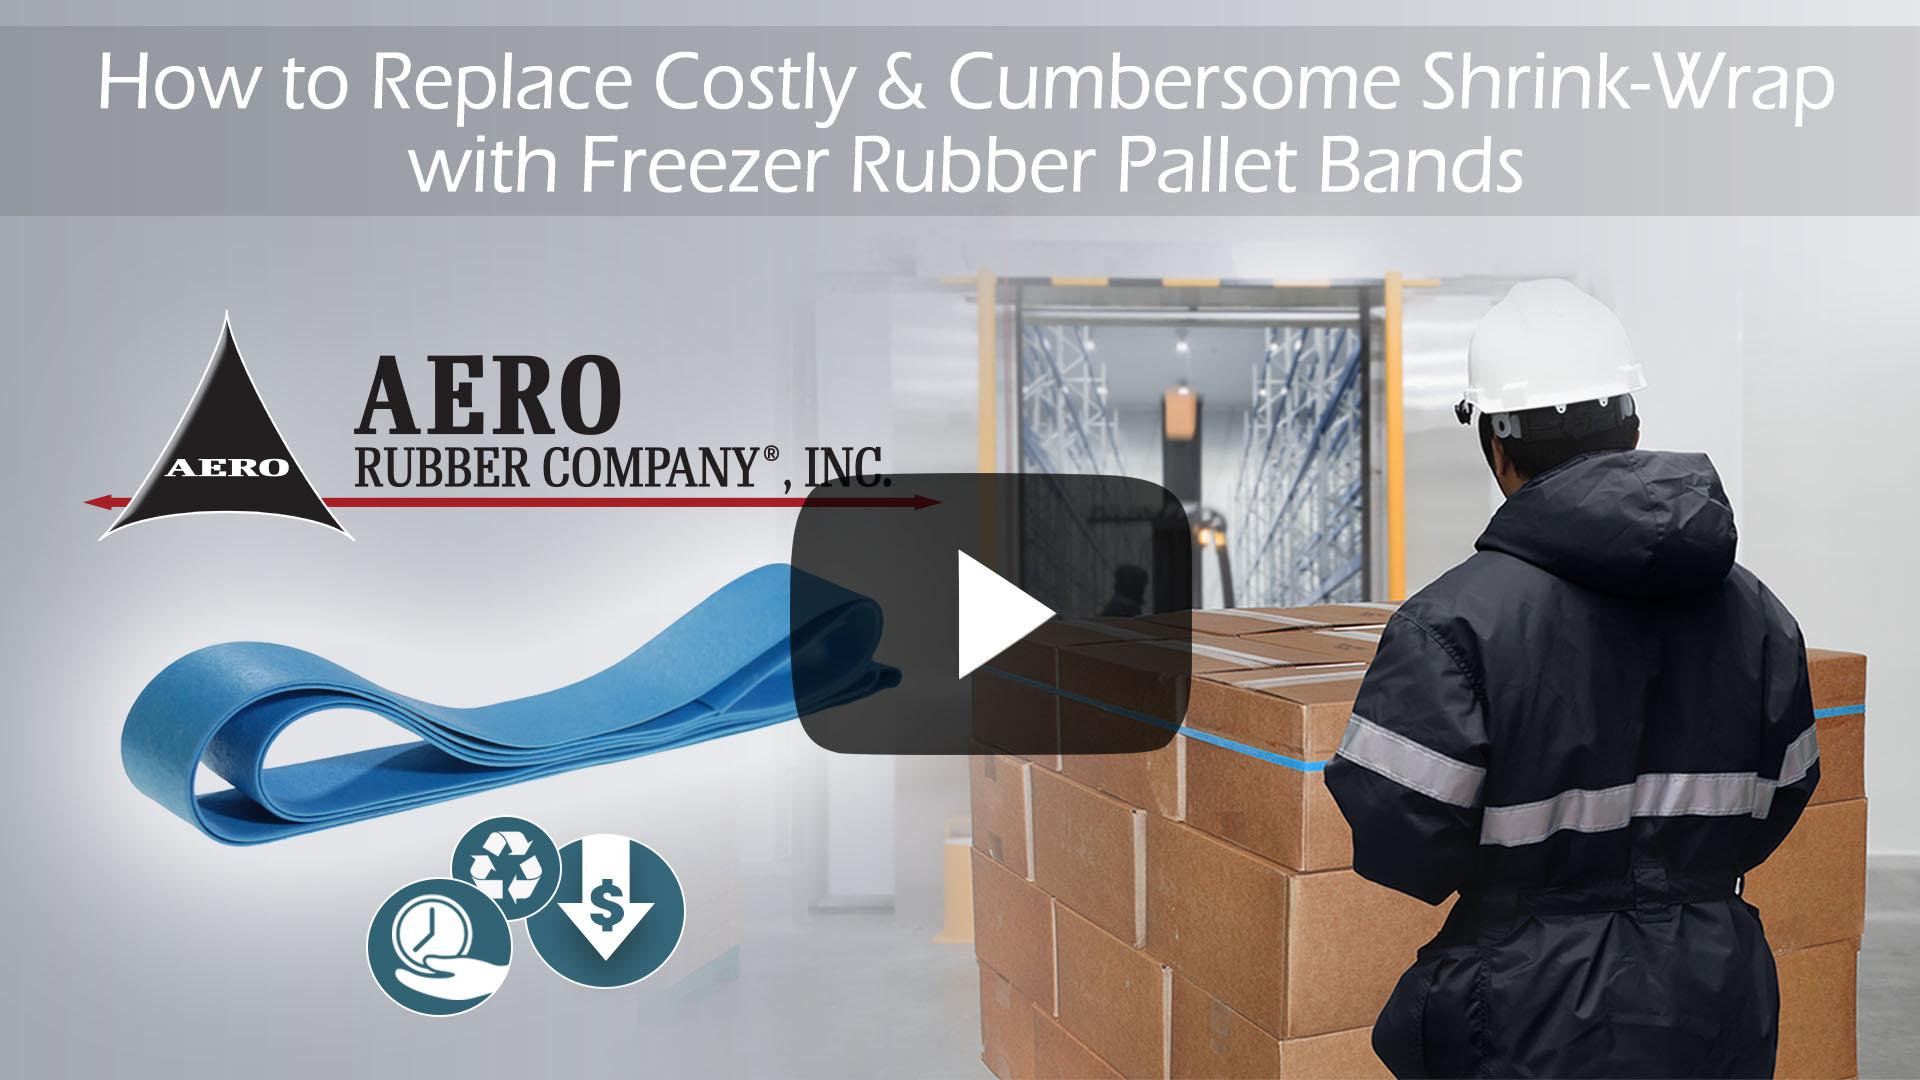 Freezer Rubber Pallet Bands Video